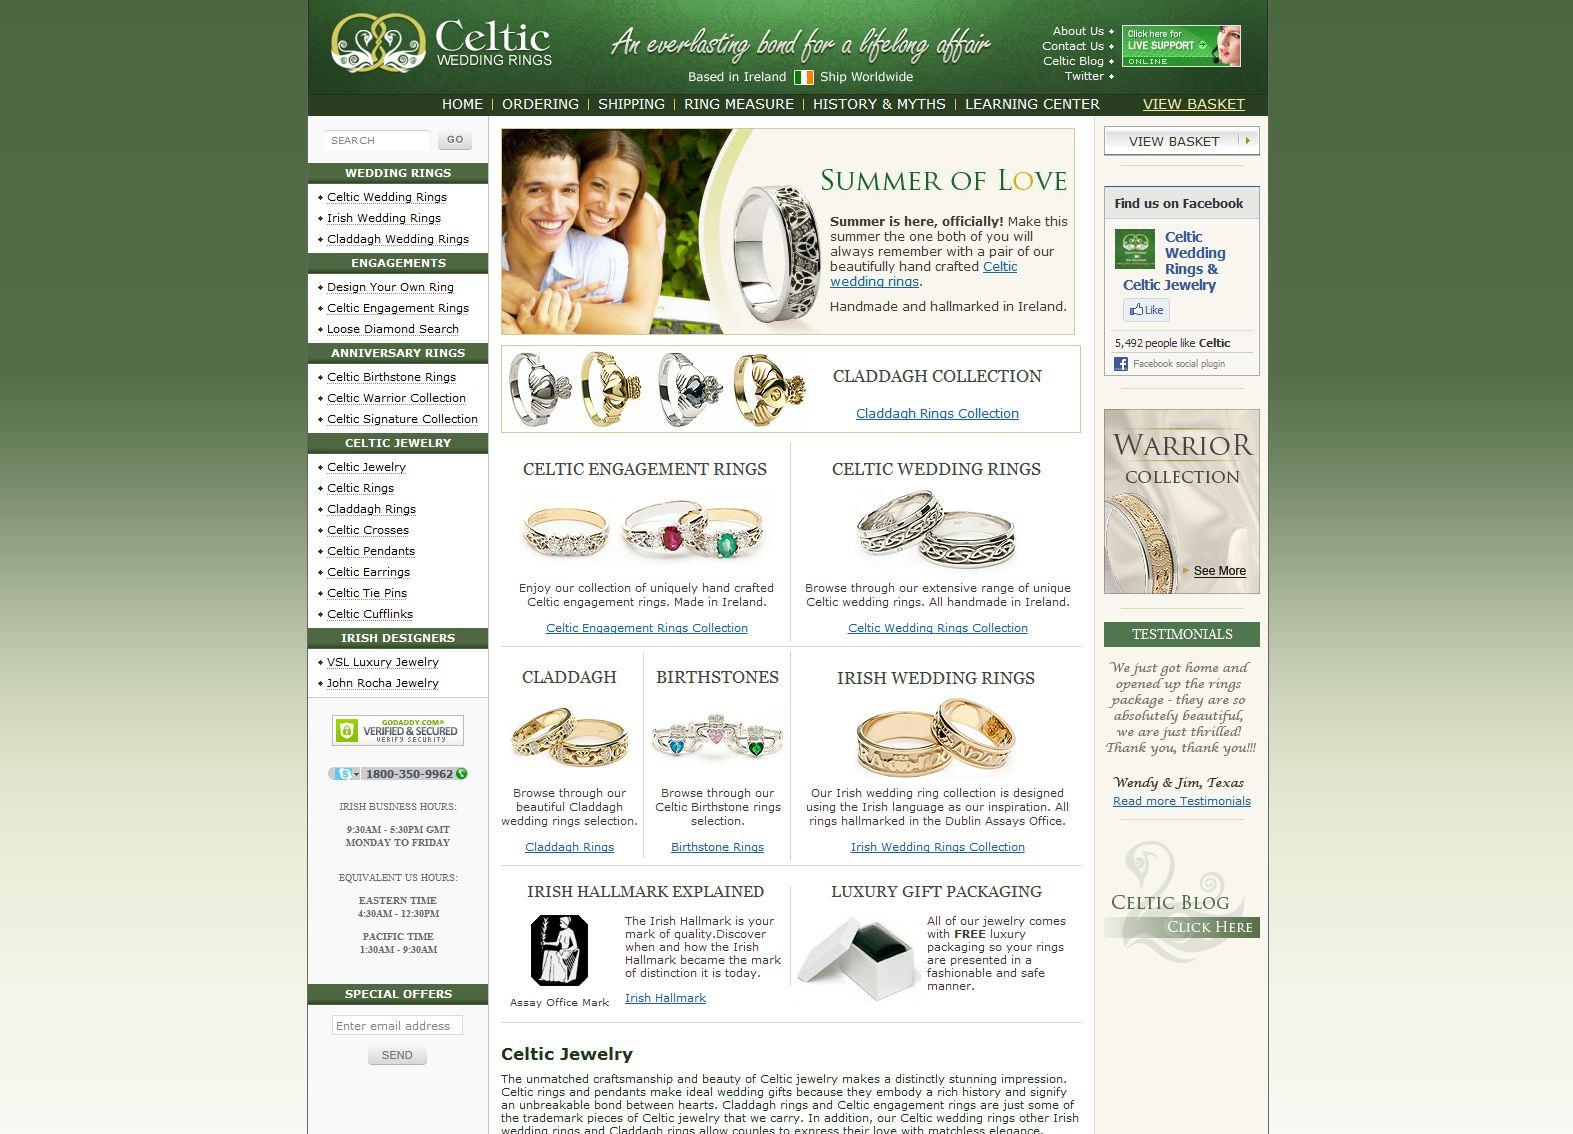 Celtic-WeddingR